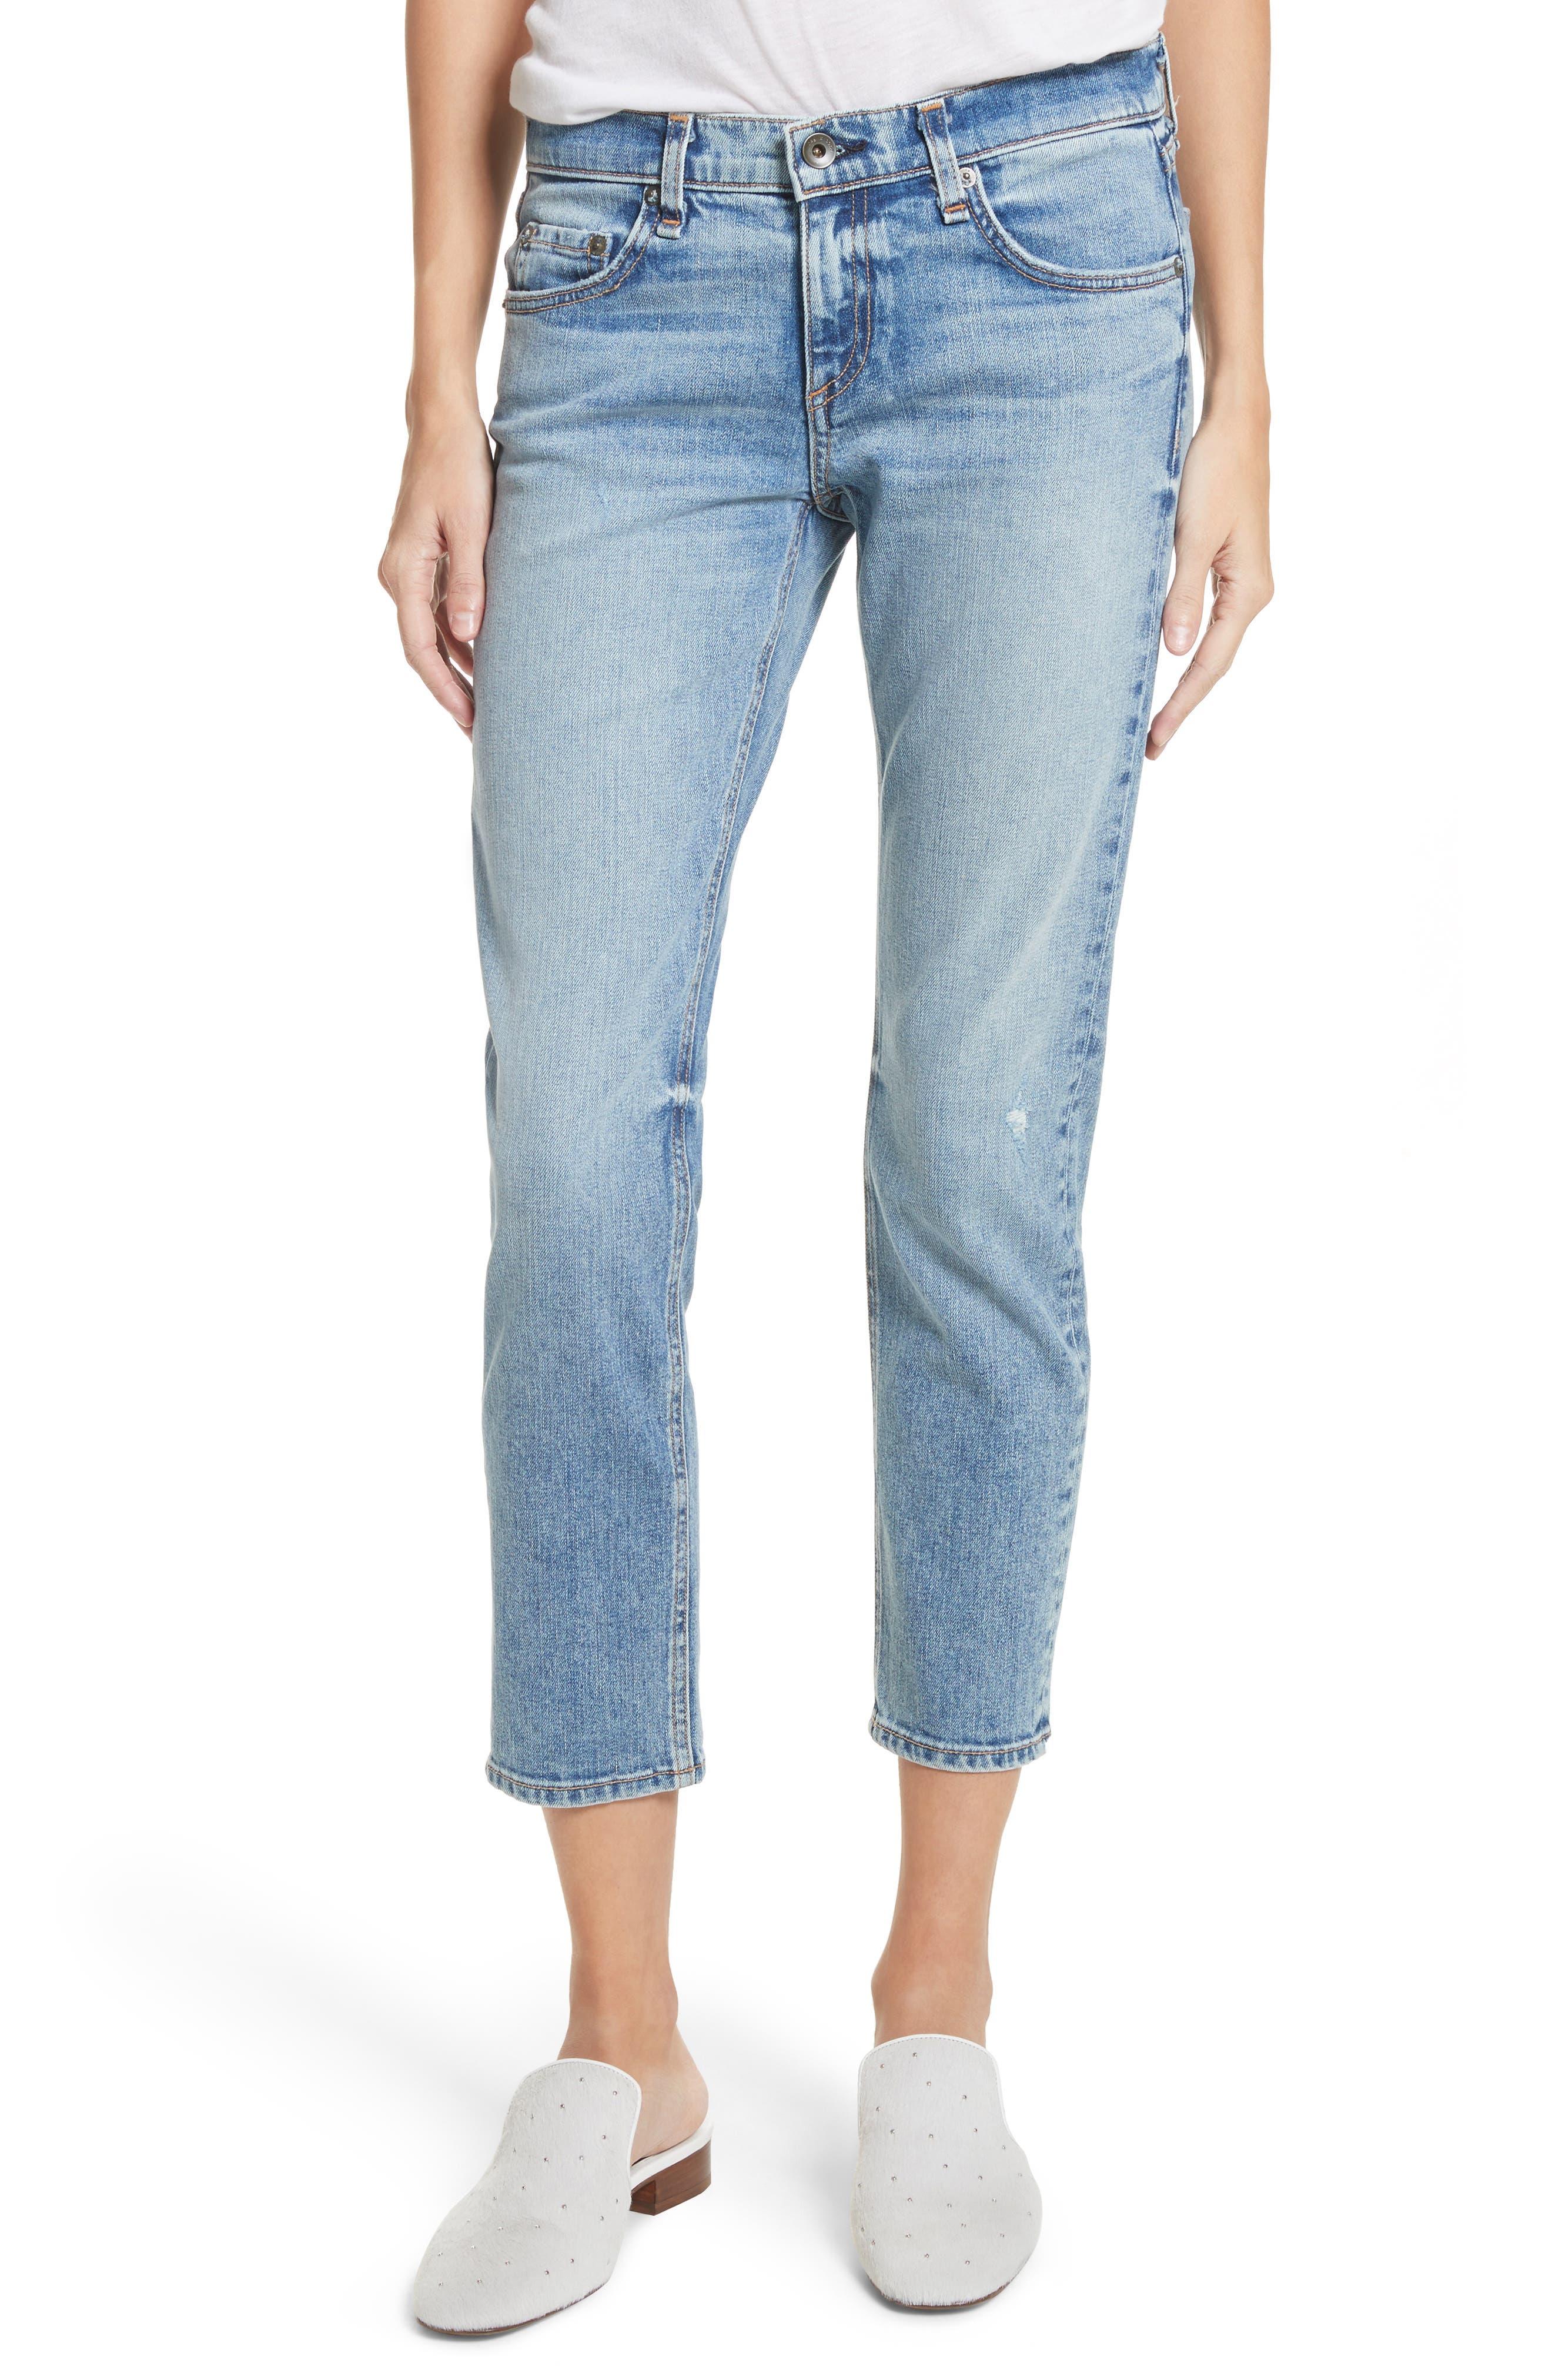 Alternate Image 1 Selected - rag & bone/JEAN The Dre Ankle Slim Boyfriend Jeans (Alphaville)